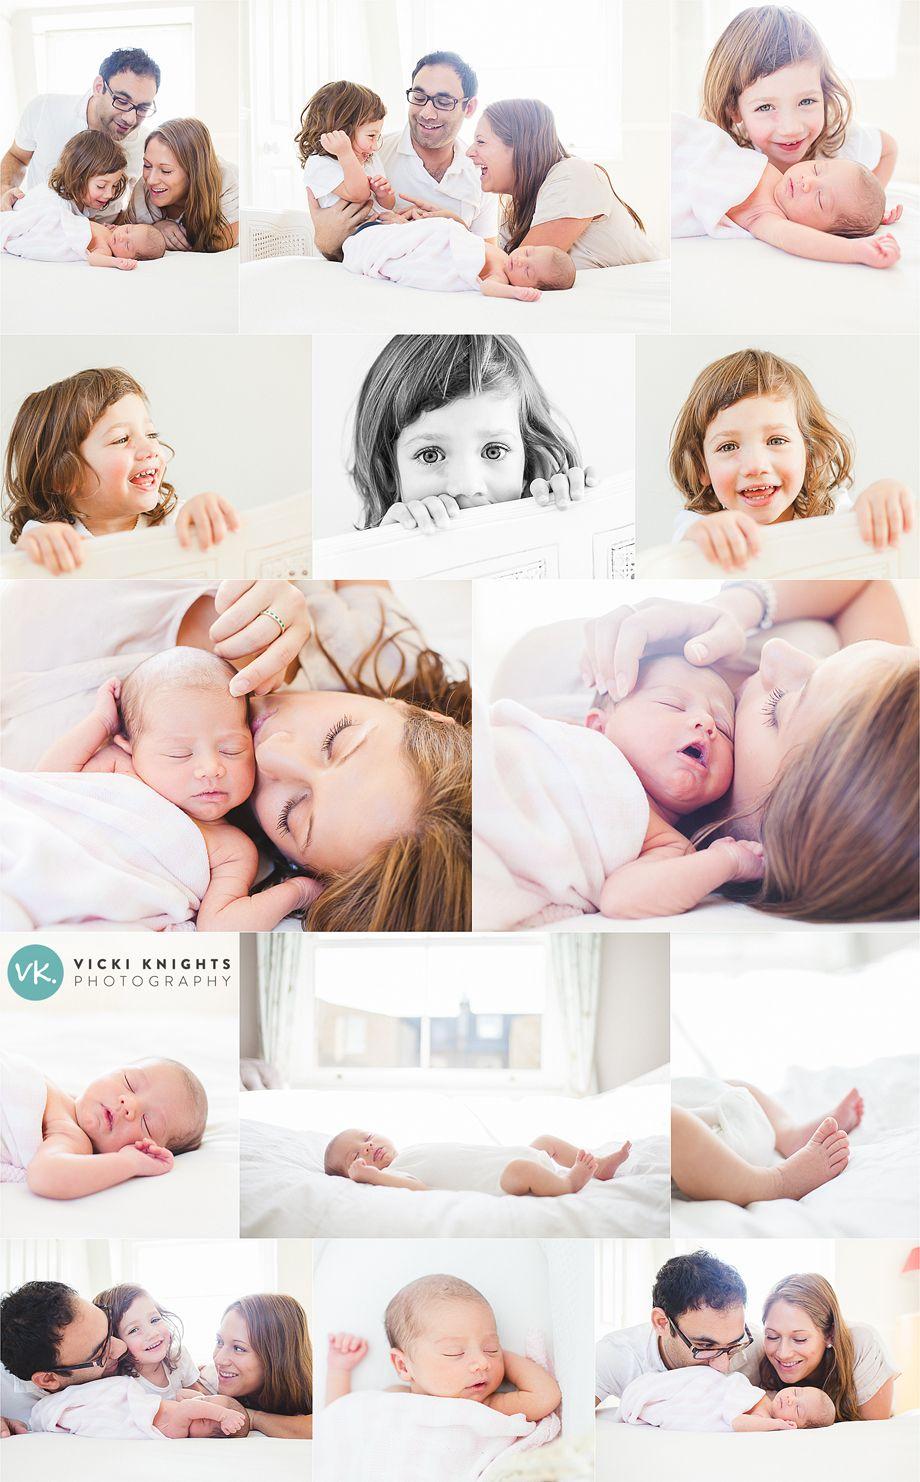 surrey-newborn-photo-shoot-at-home | Baby ideas | Pinterest ...